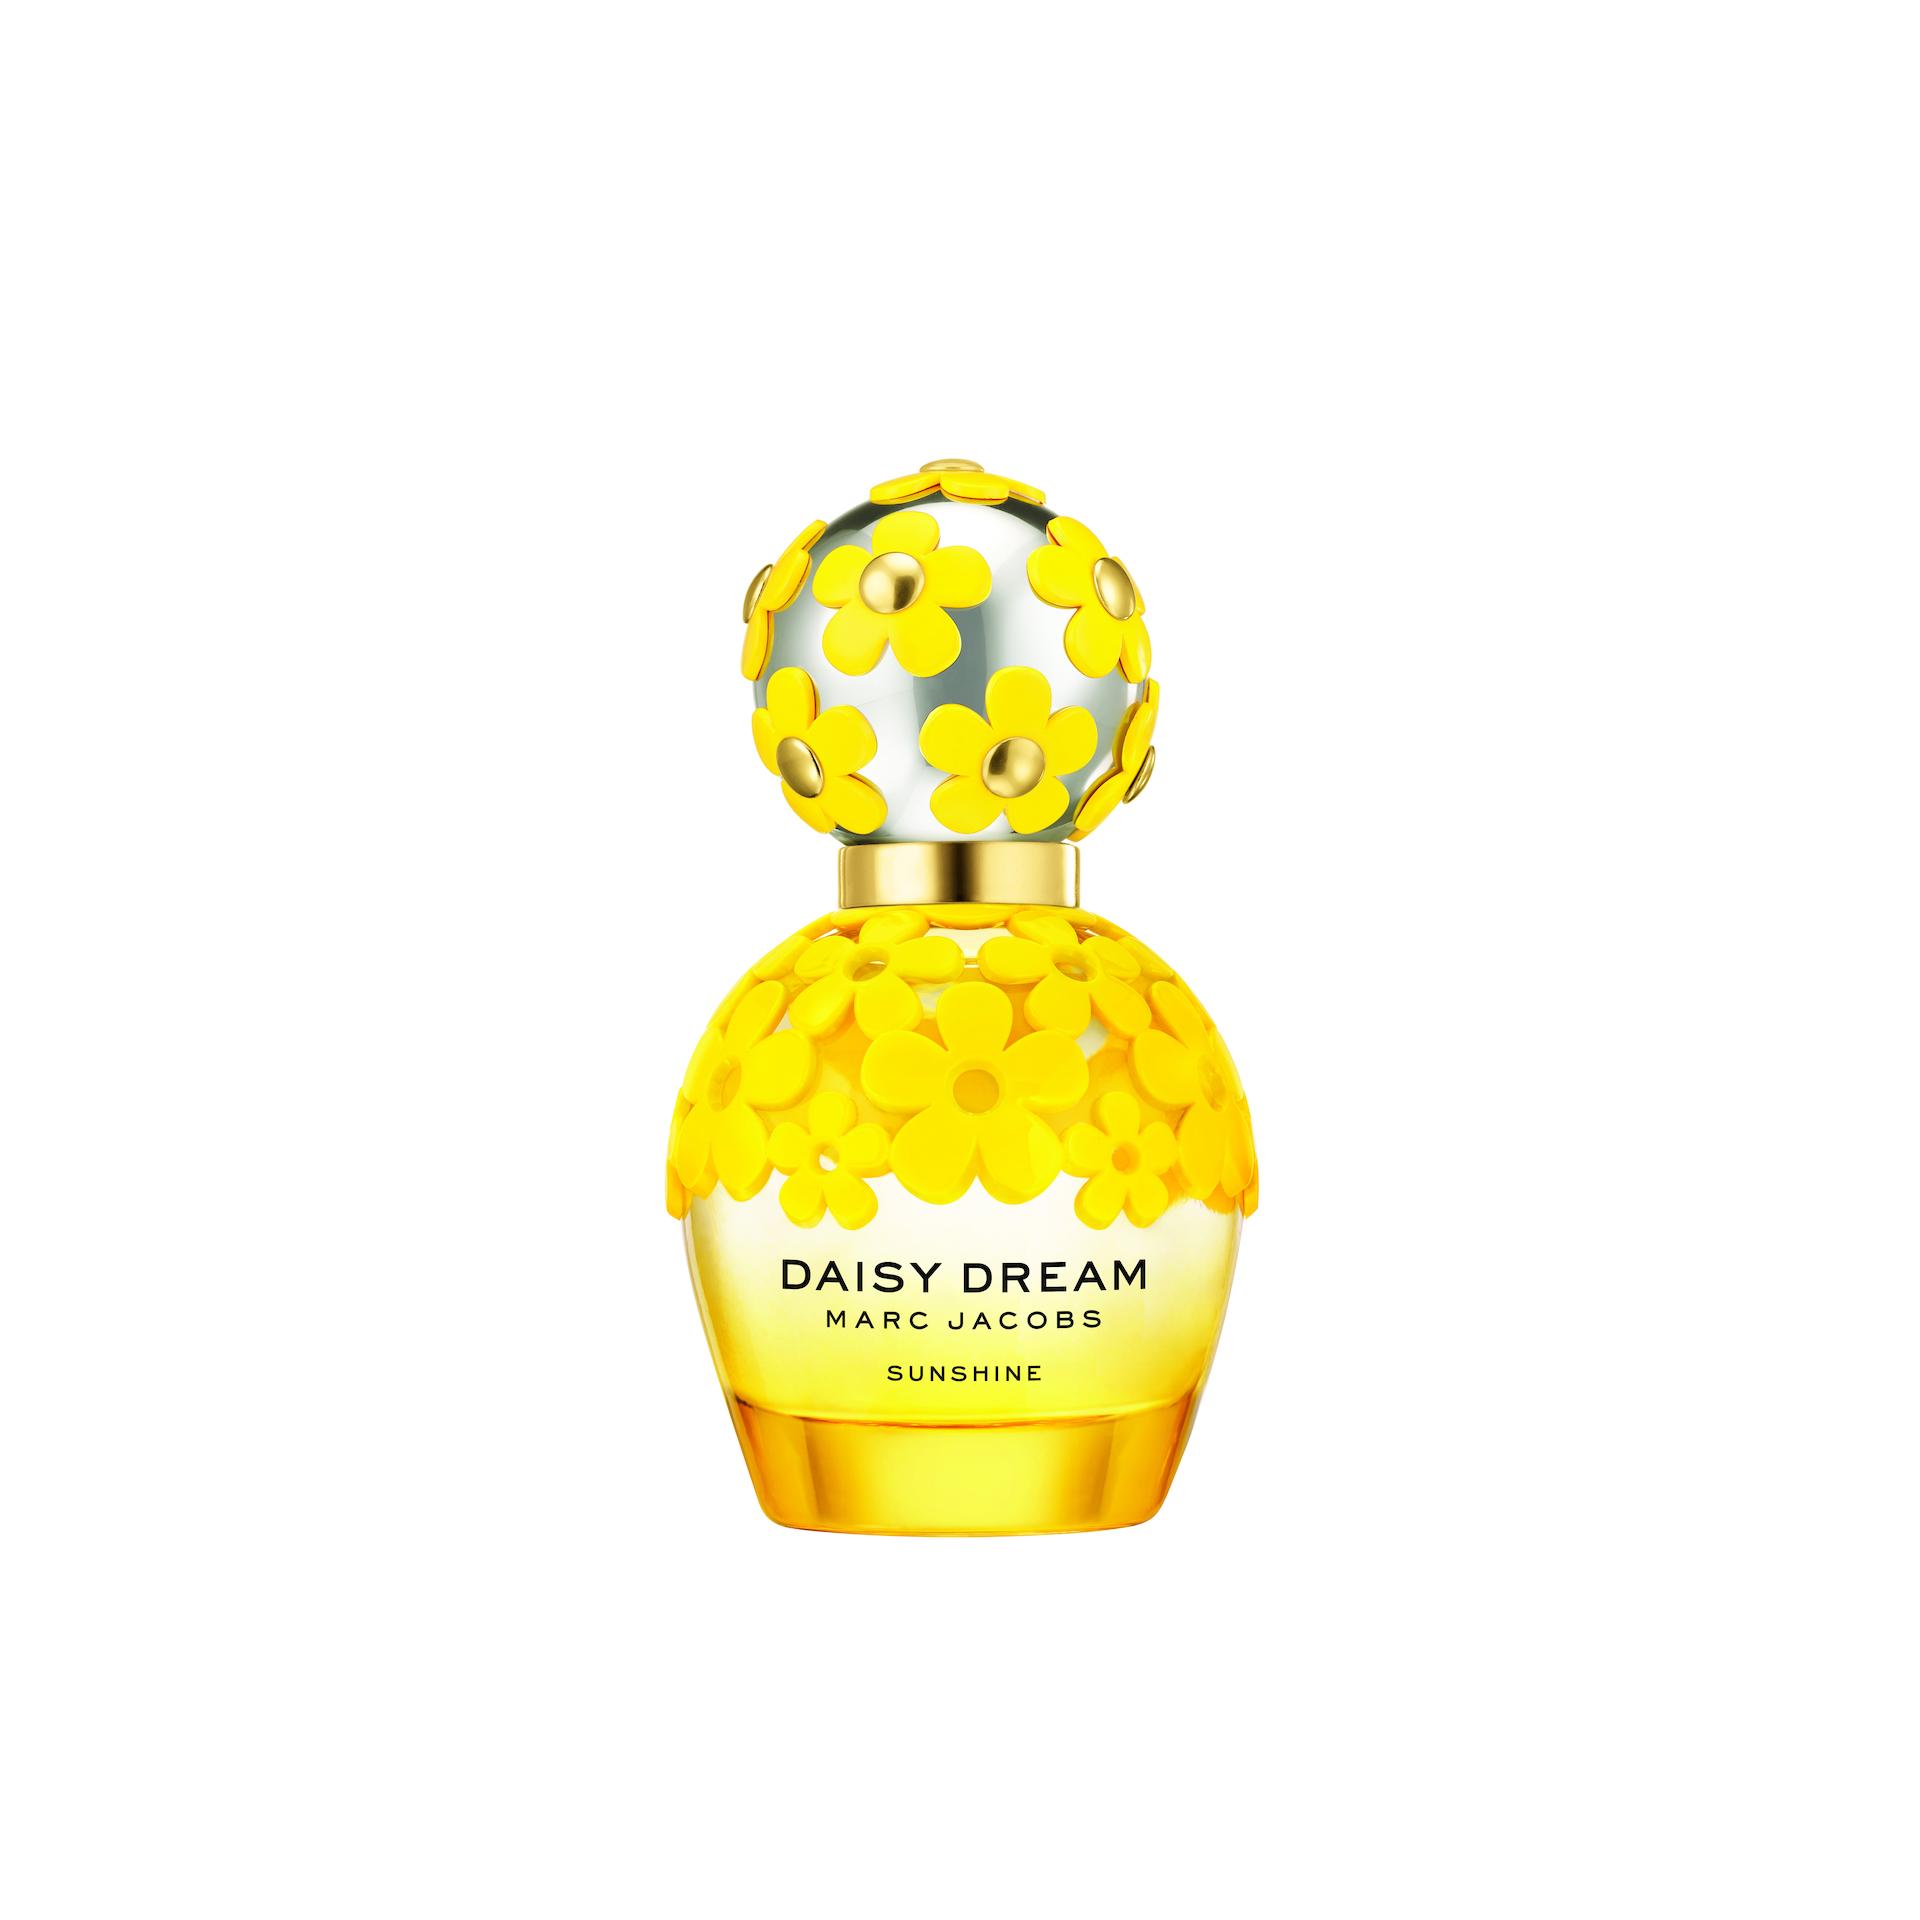 Daisy Dream Sunshine Edt 50ml